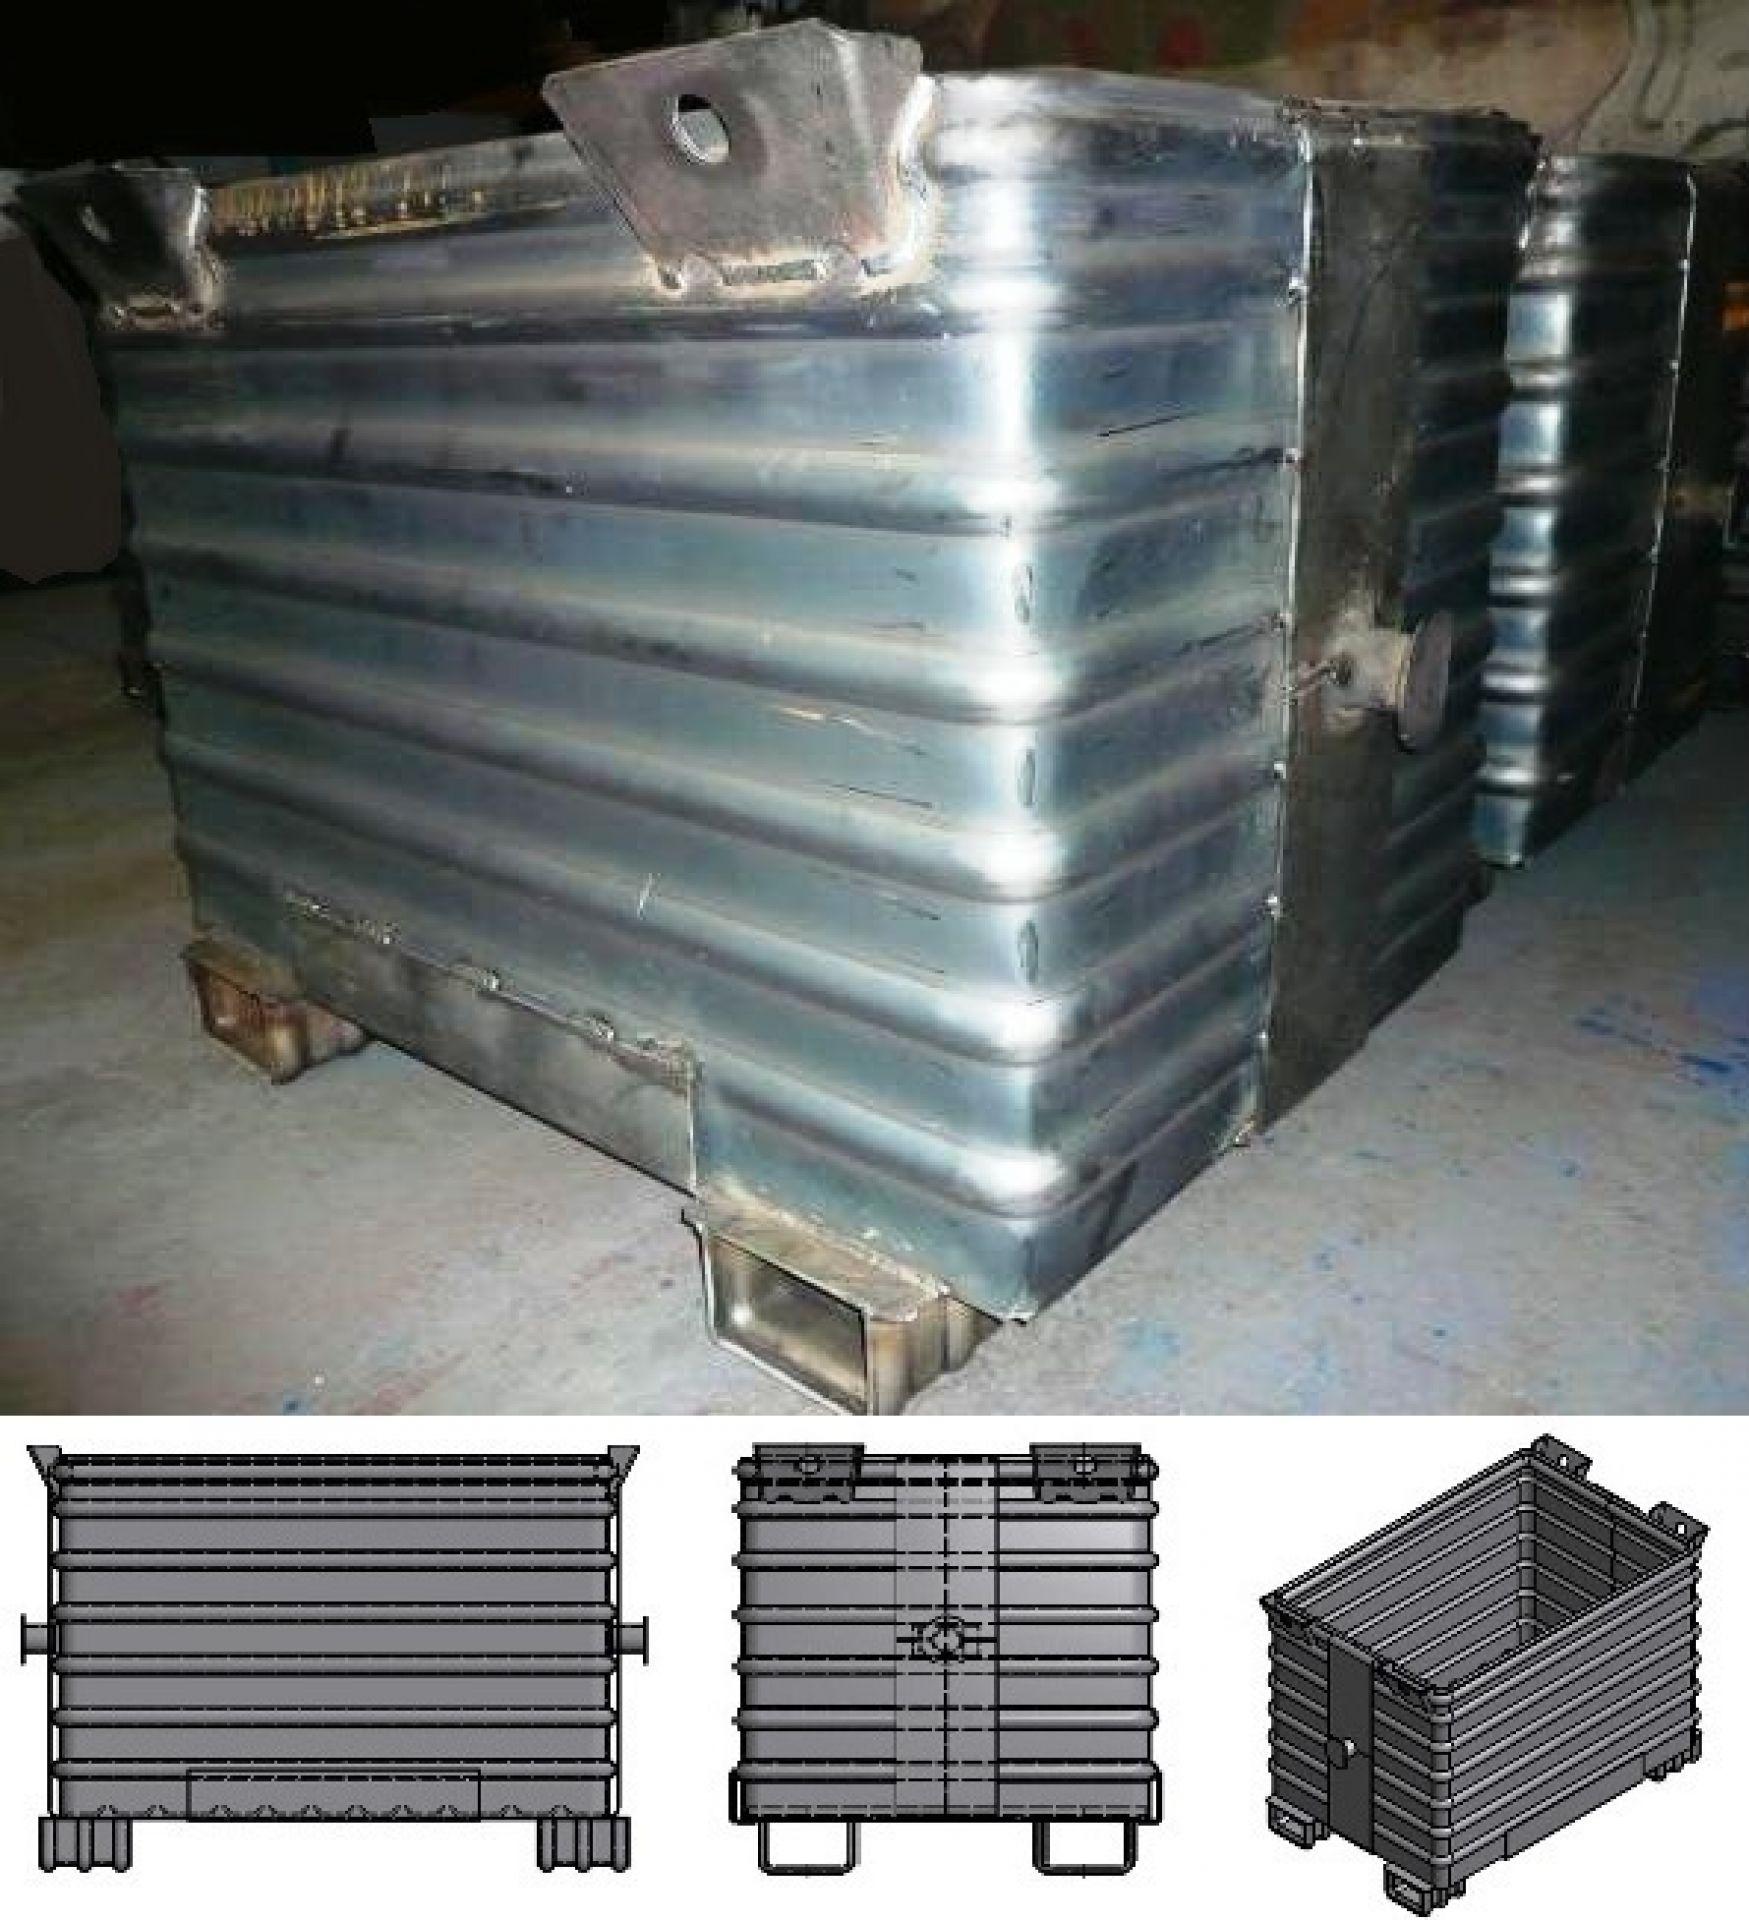 Recyclingbehälter für Metallschrott